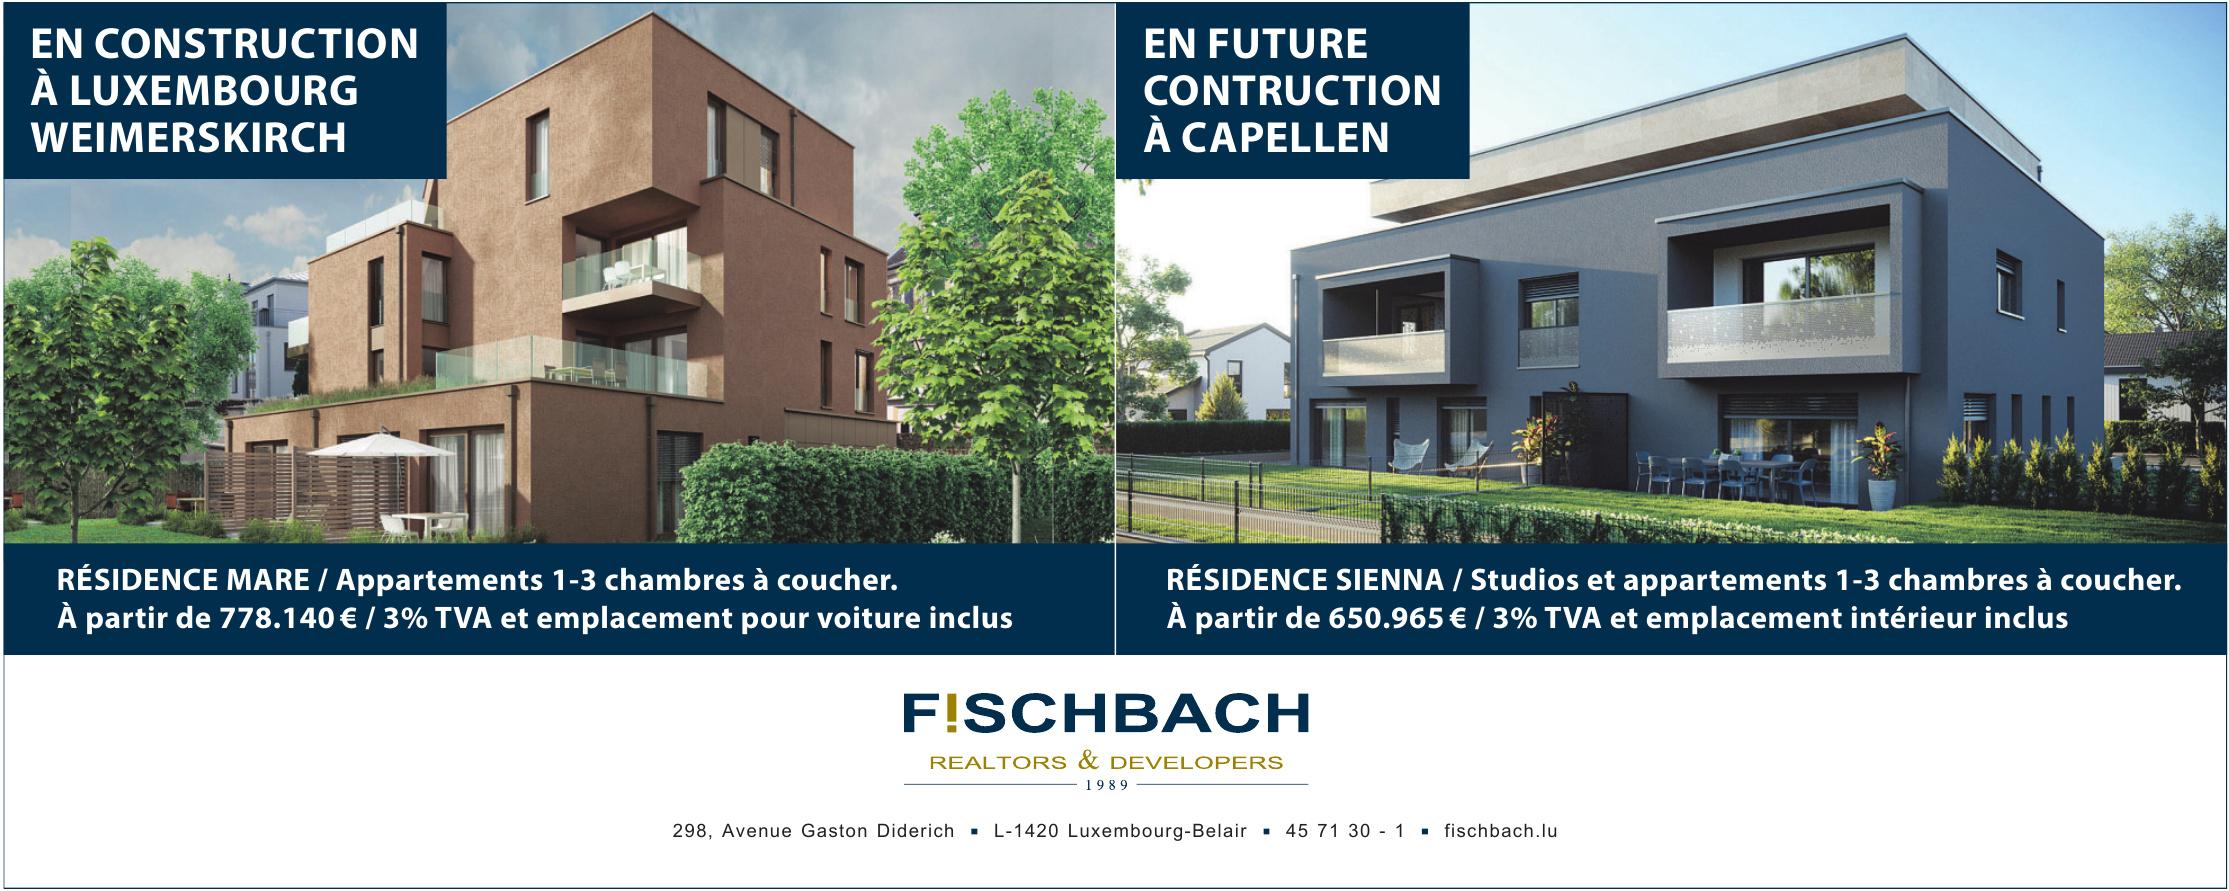 FISCHBACH Realtors & Developers